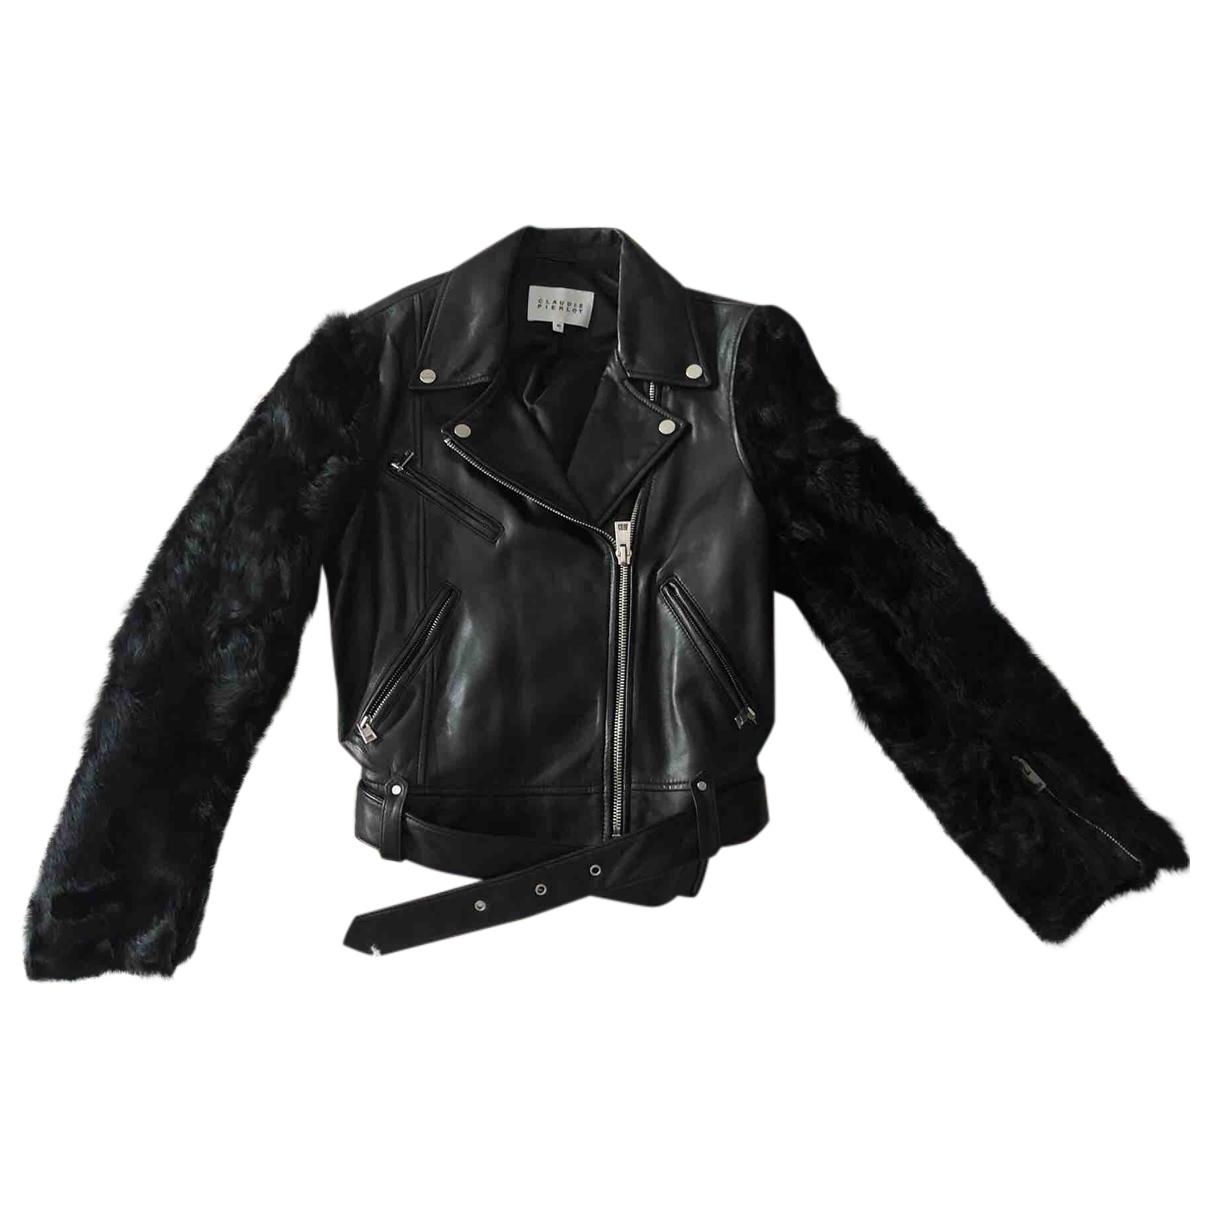 Claudie Pierlot \N Black Leather jacket for Women 40 FR